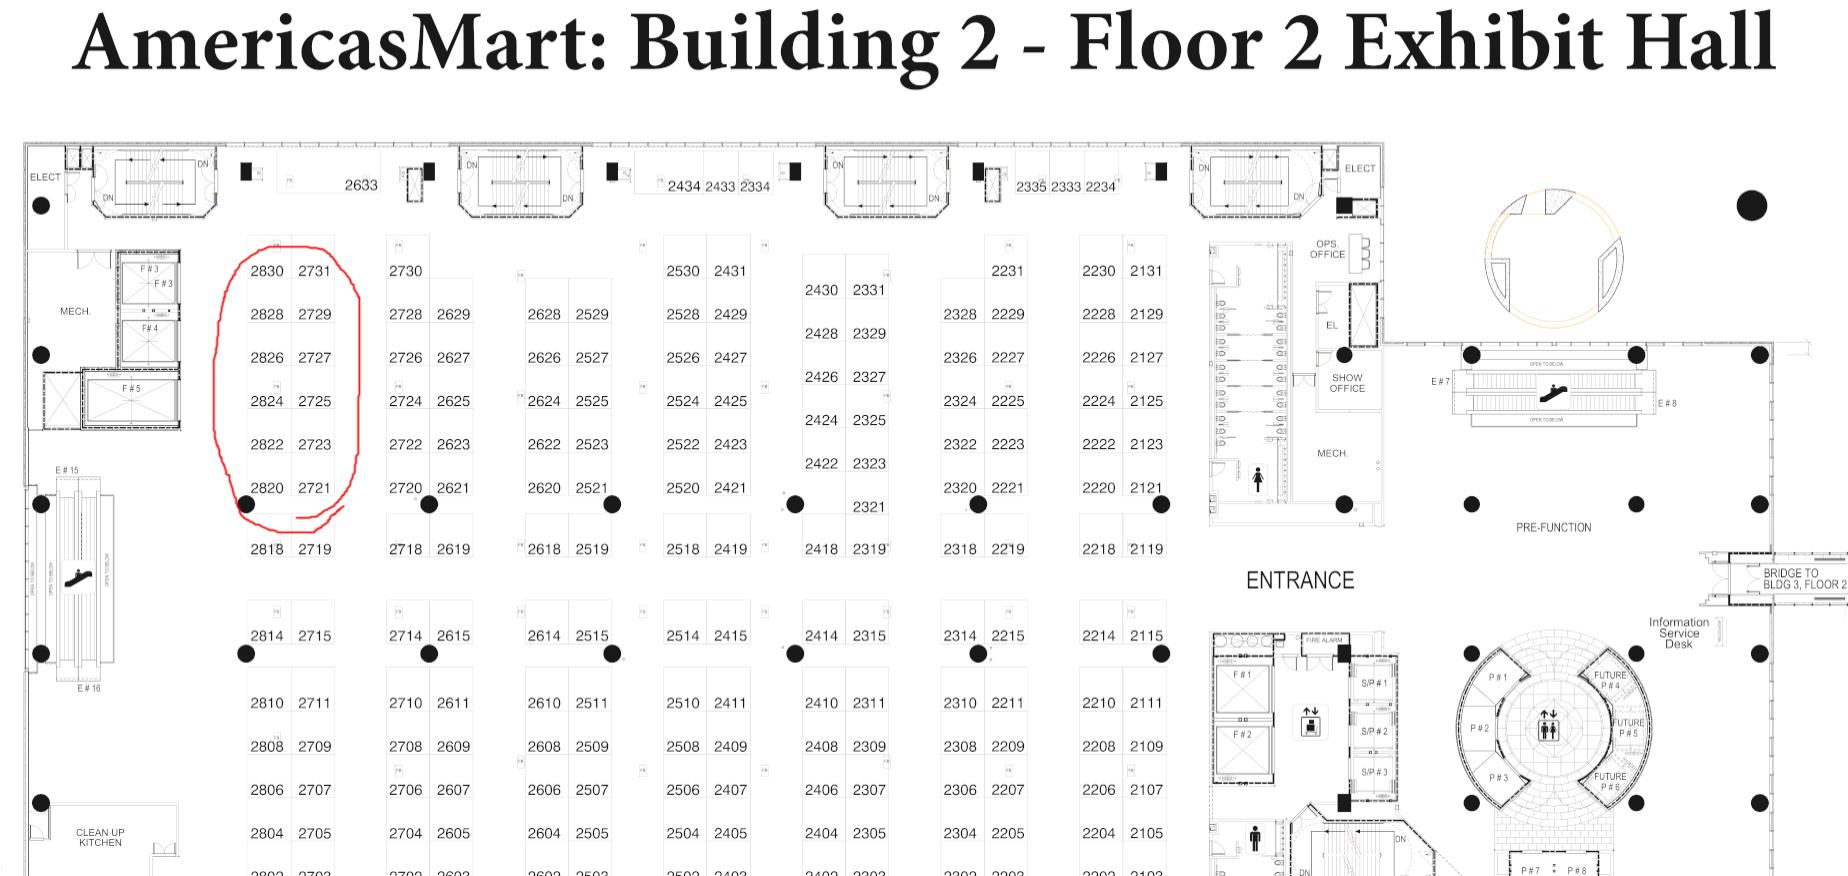 LitRPG Booths Map Large.jpg